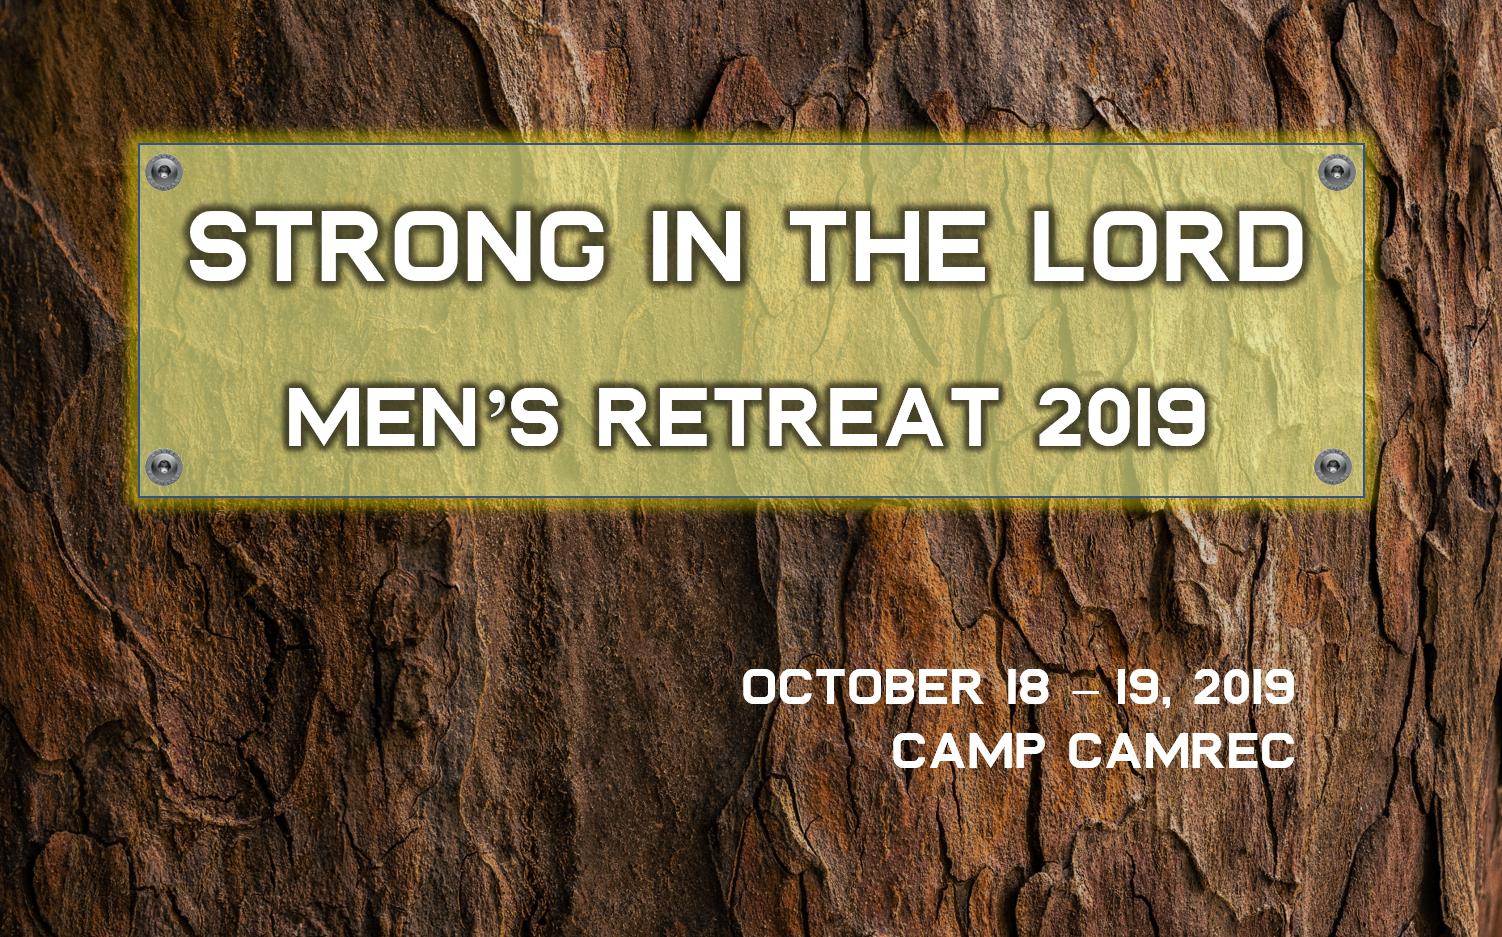 Men's Retreat 2019.png